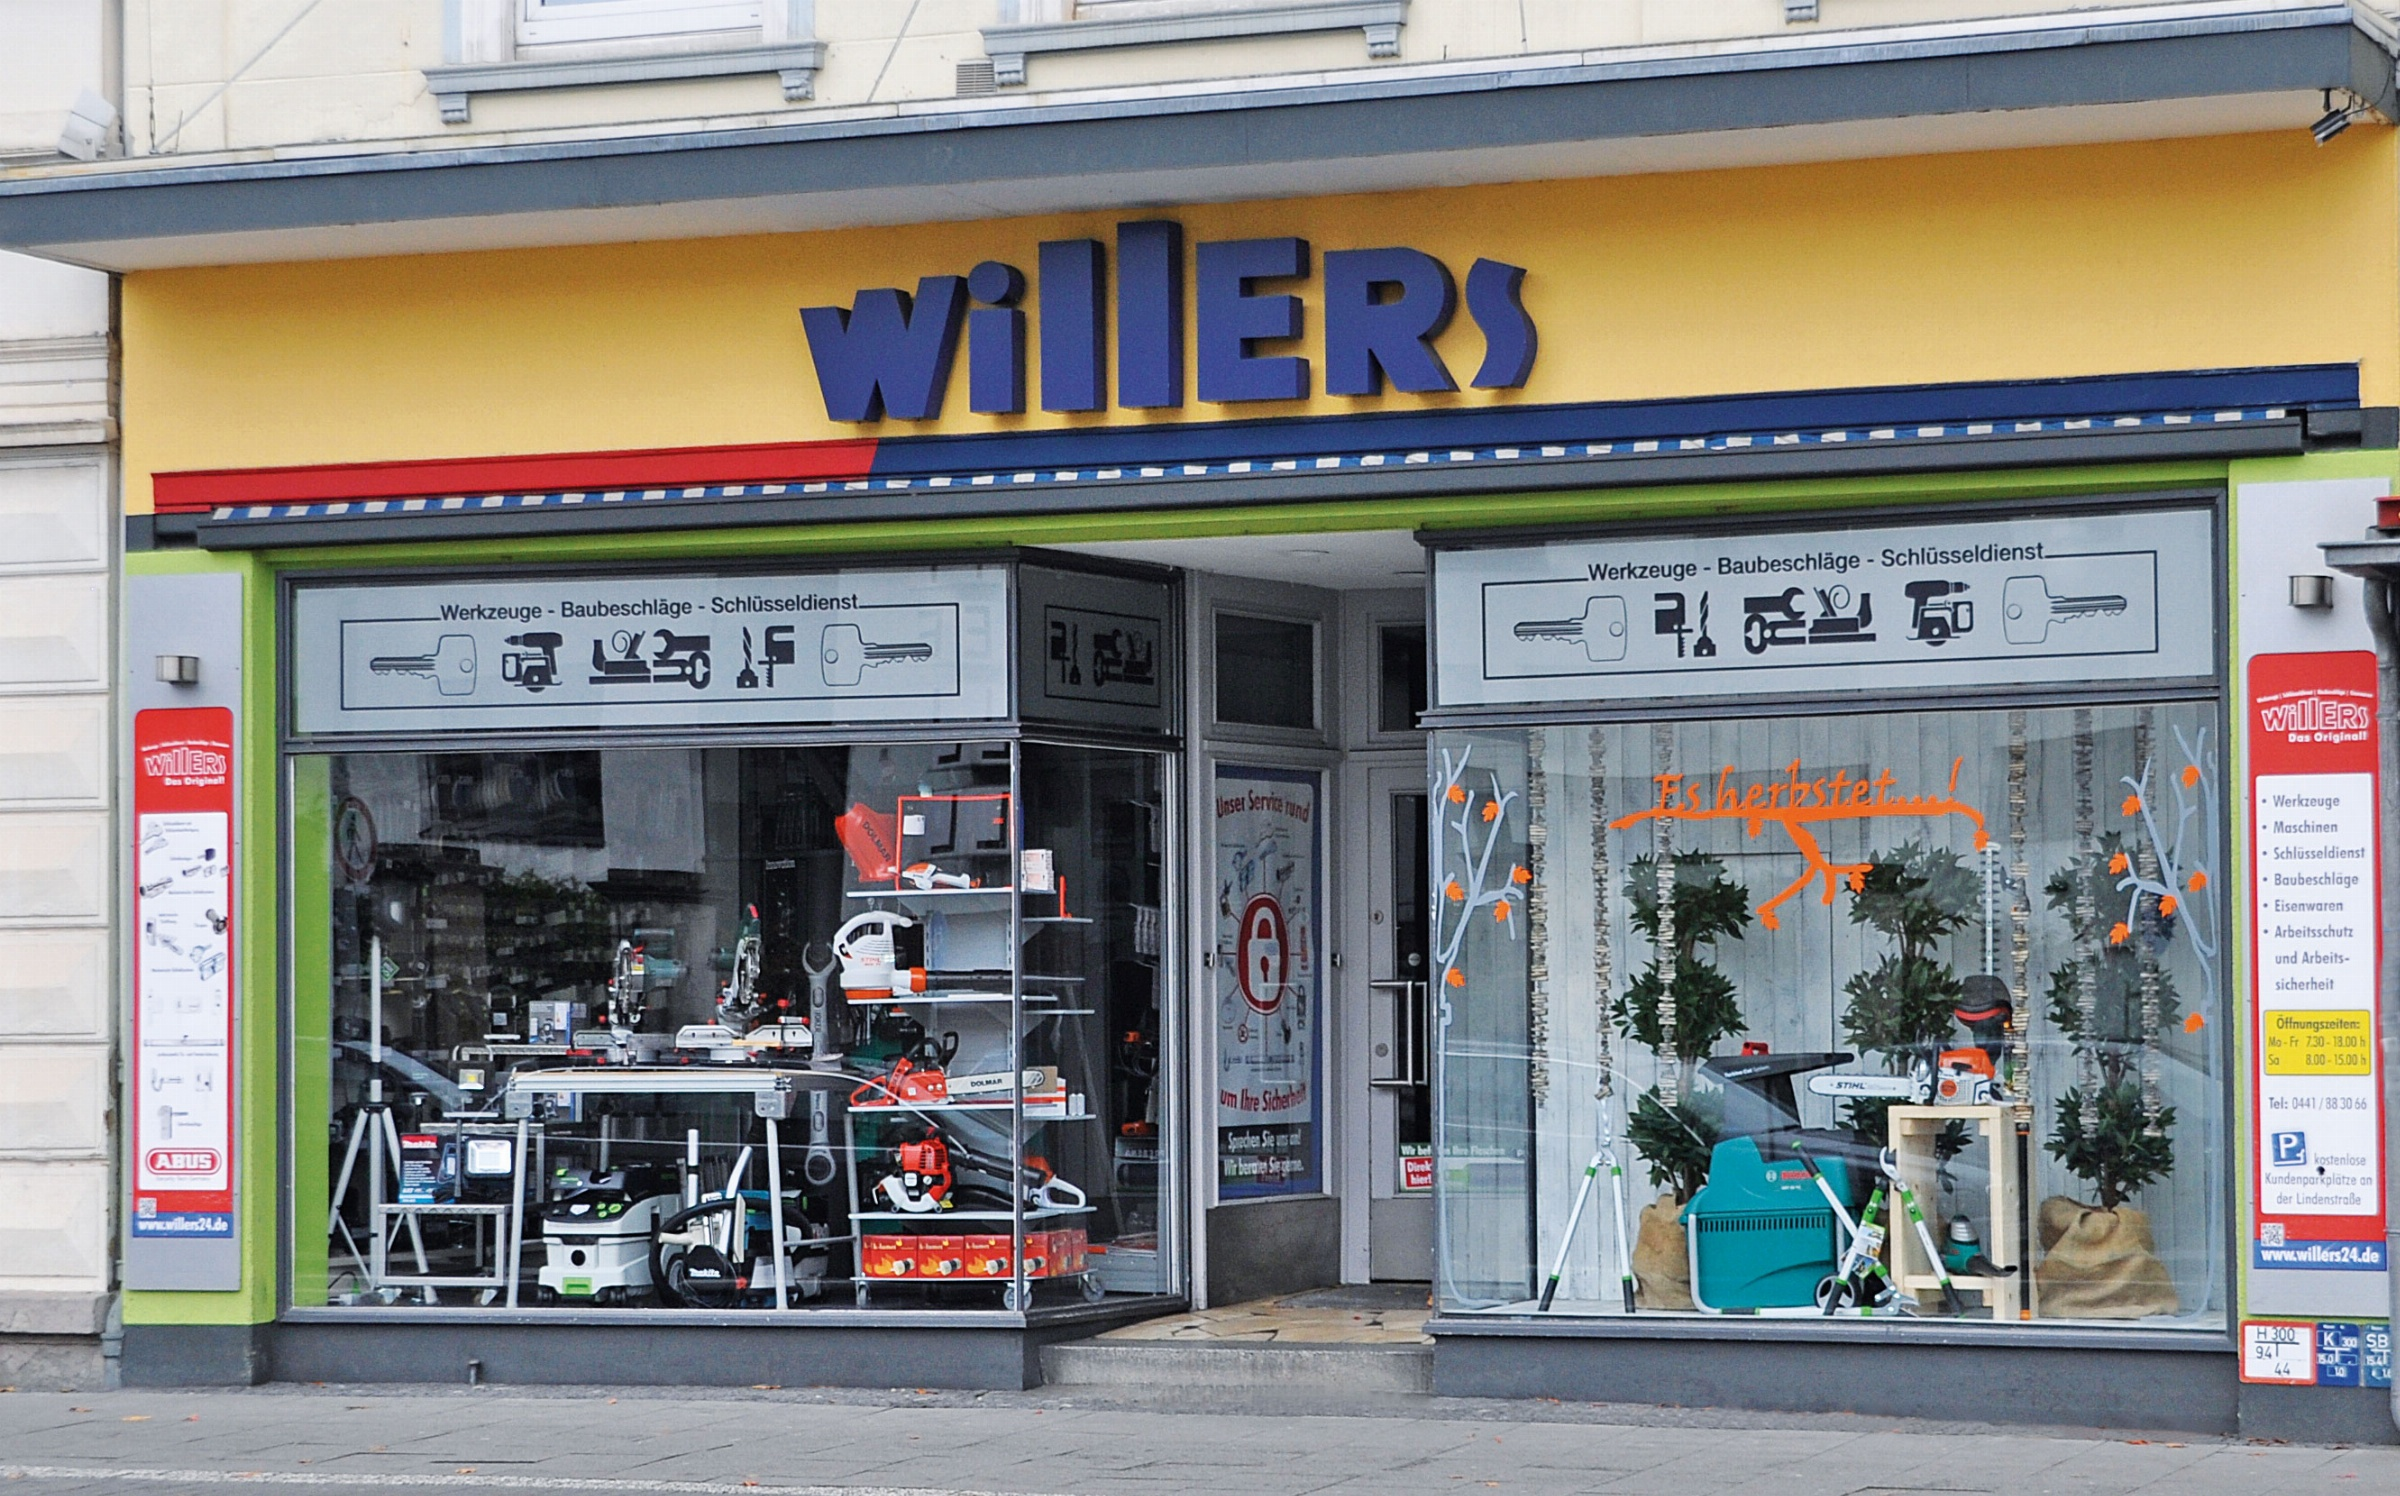 Willers Oldenburg